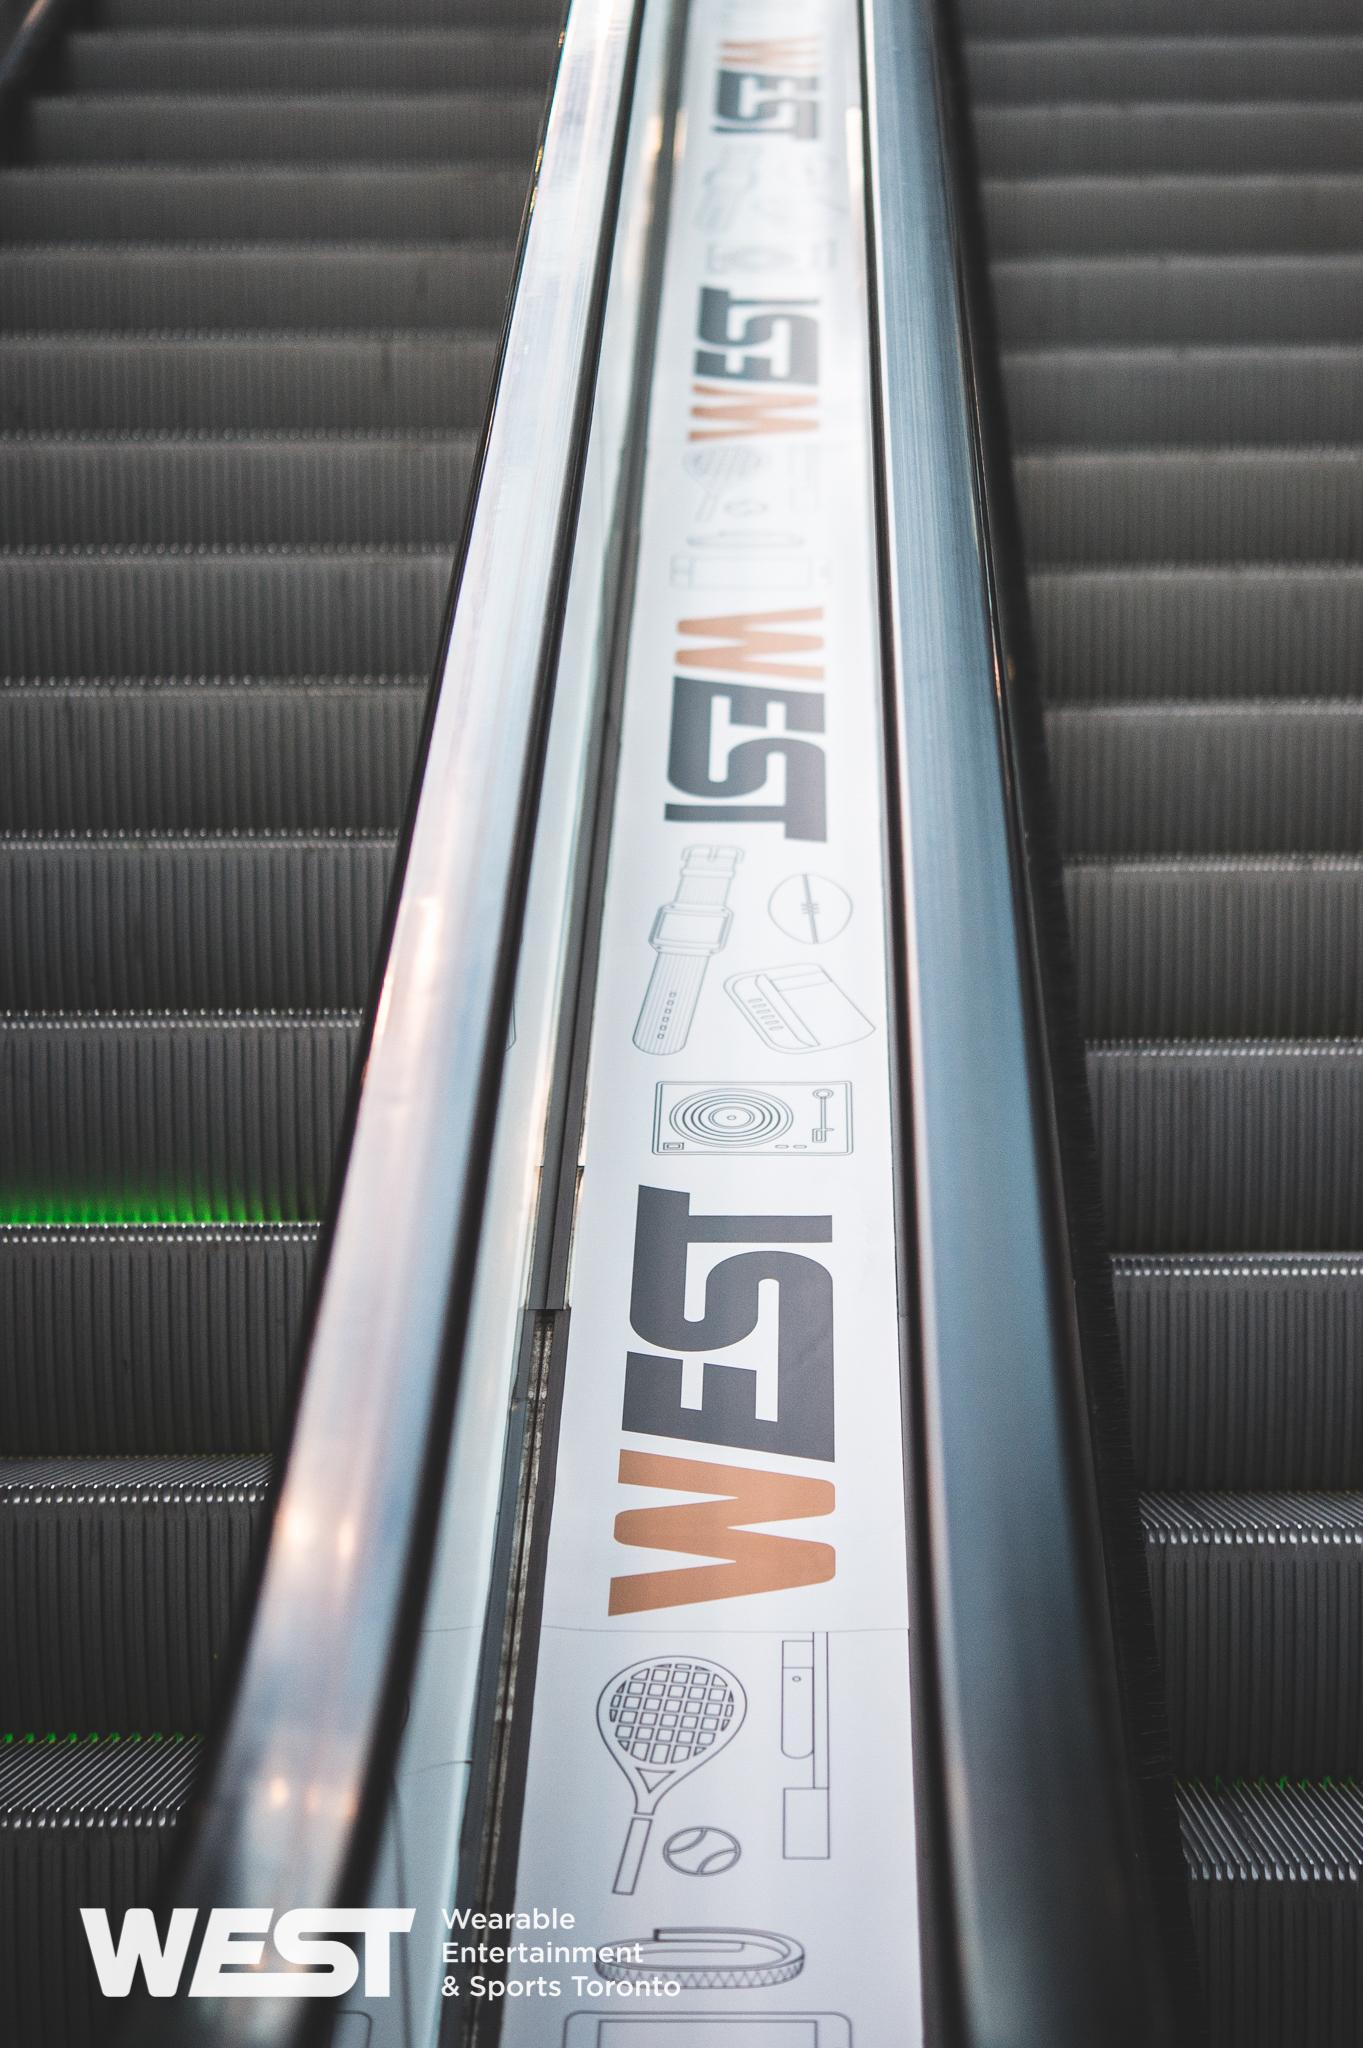 WEST2015-MaRS-Tarsipix-151103-7599.jpg